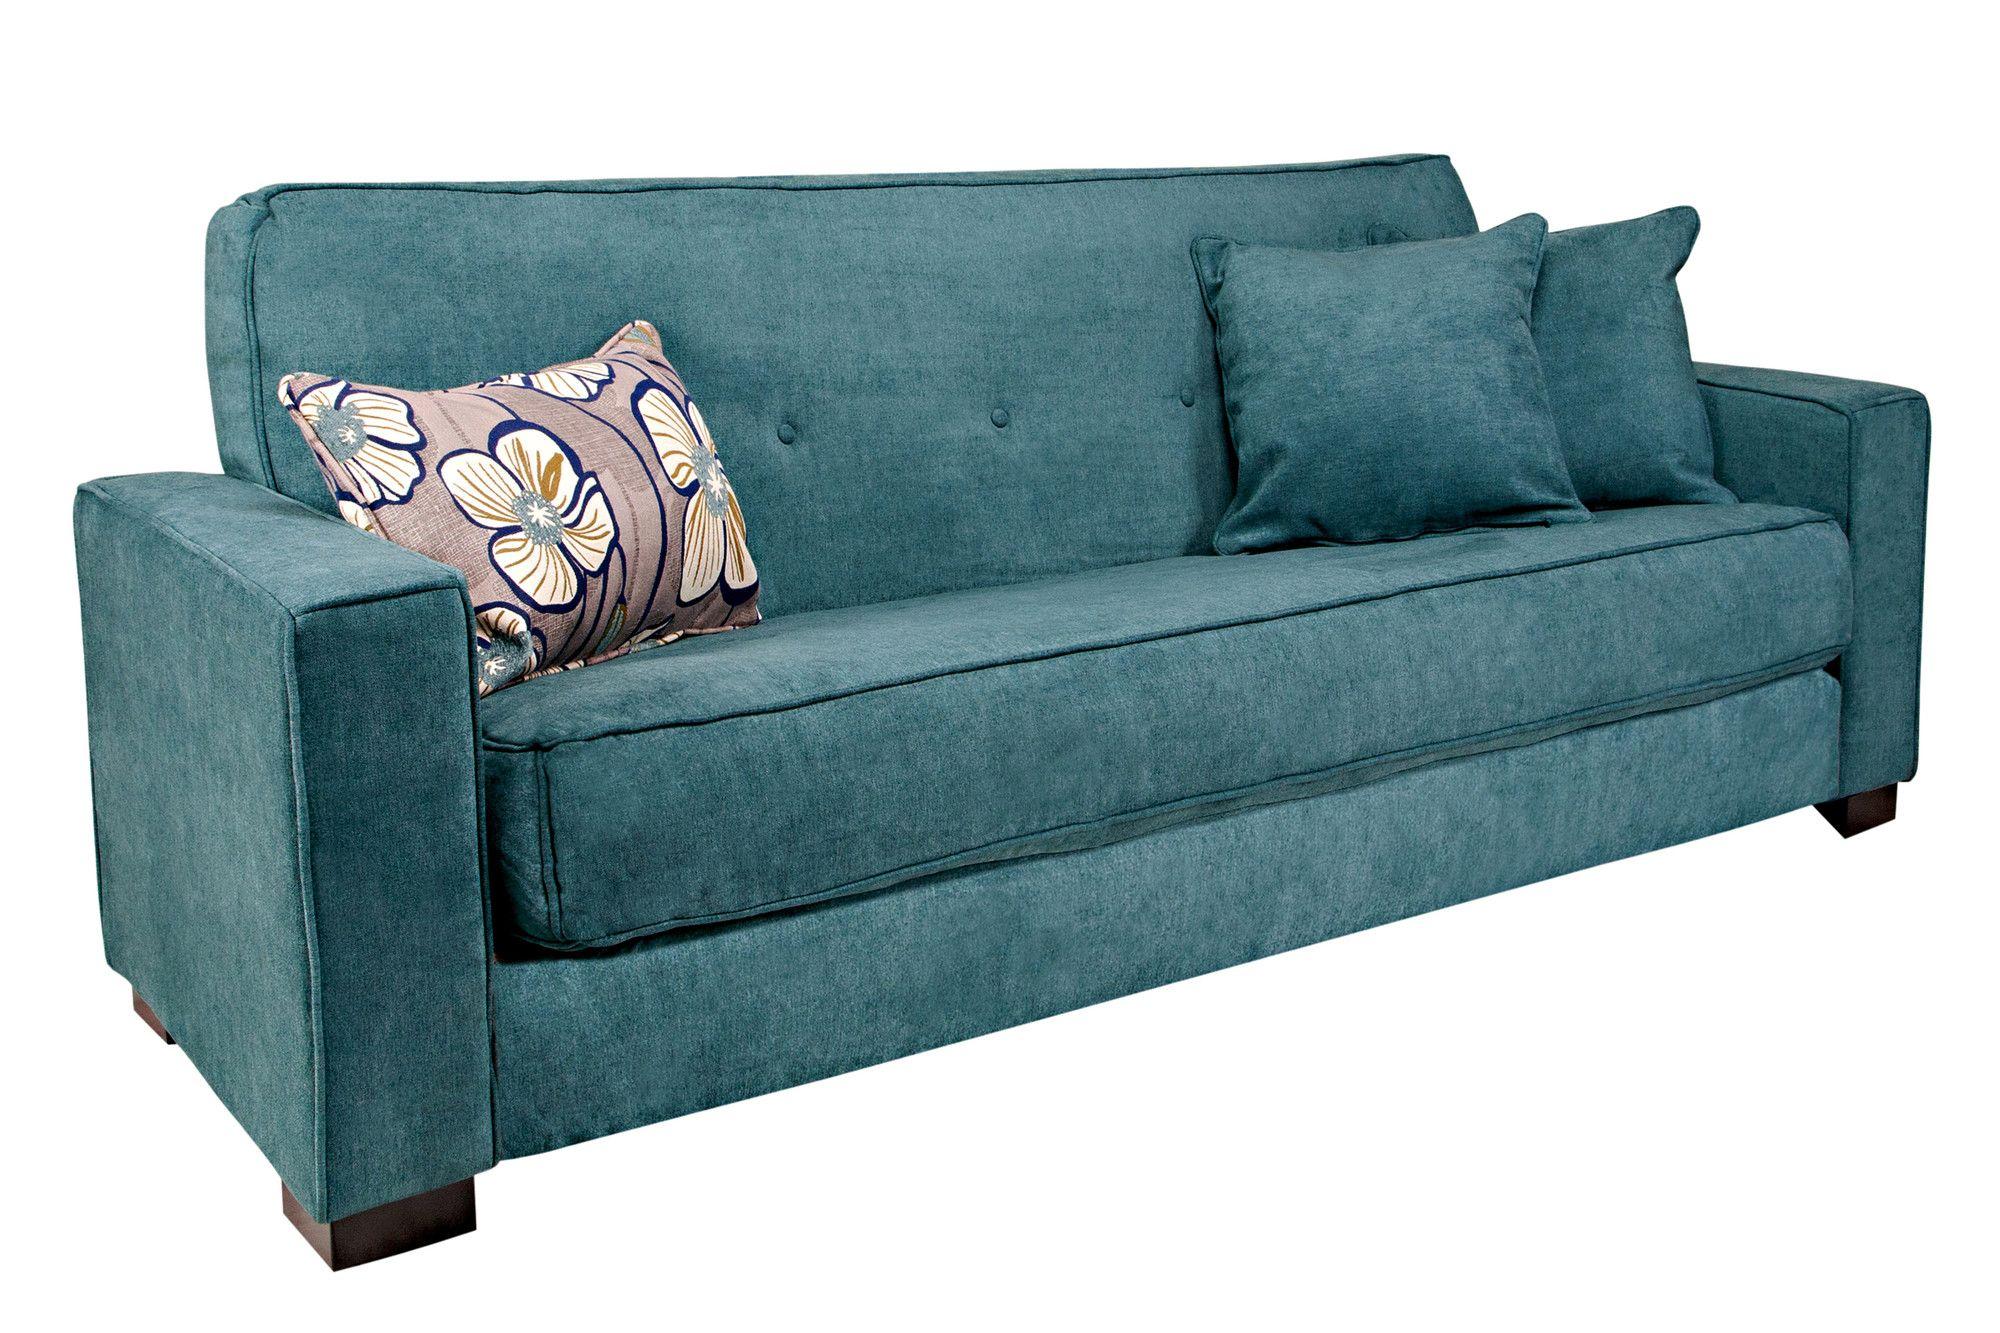 Harlem Leather Chesterfield Sofa Sofa Best Sofa Sleeper Sofa